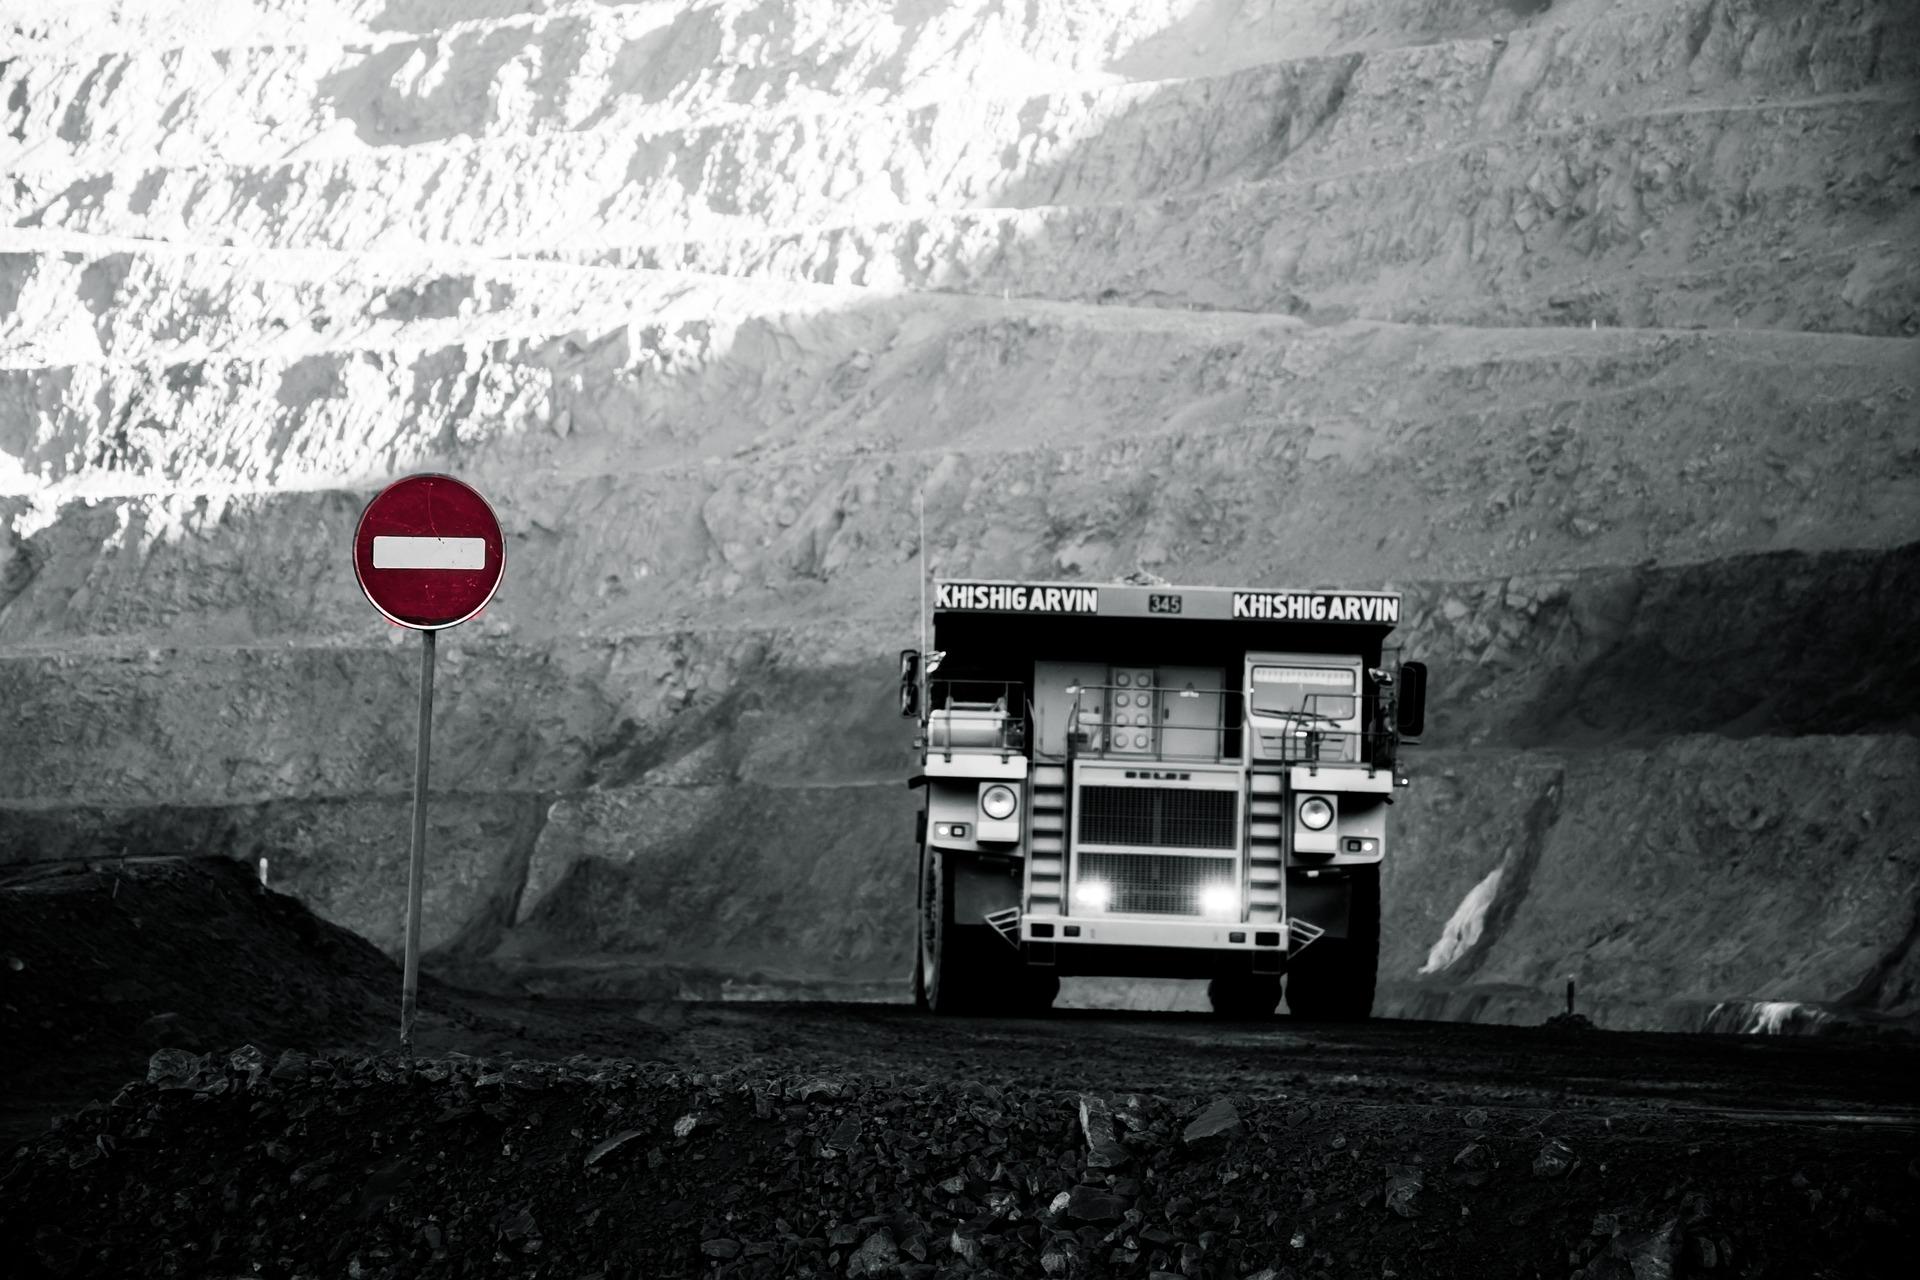 bitcoin mining miner btc dump-4711974_1920